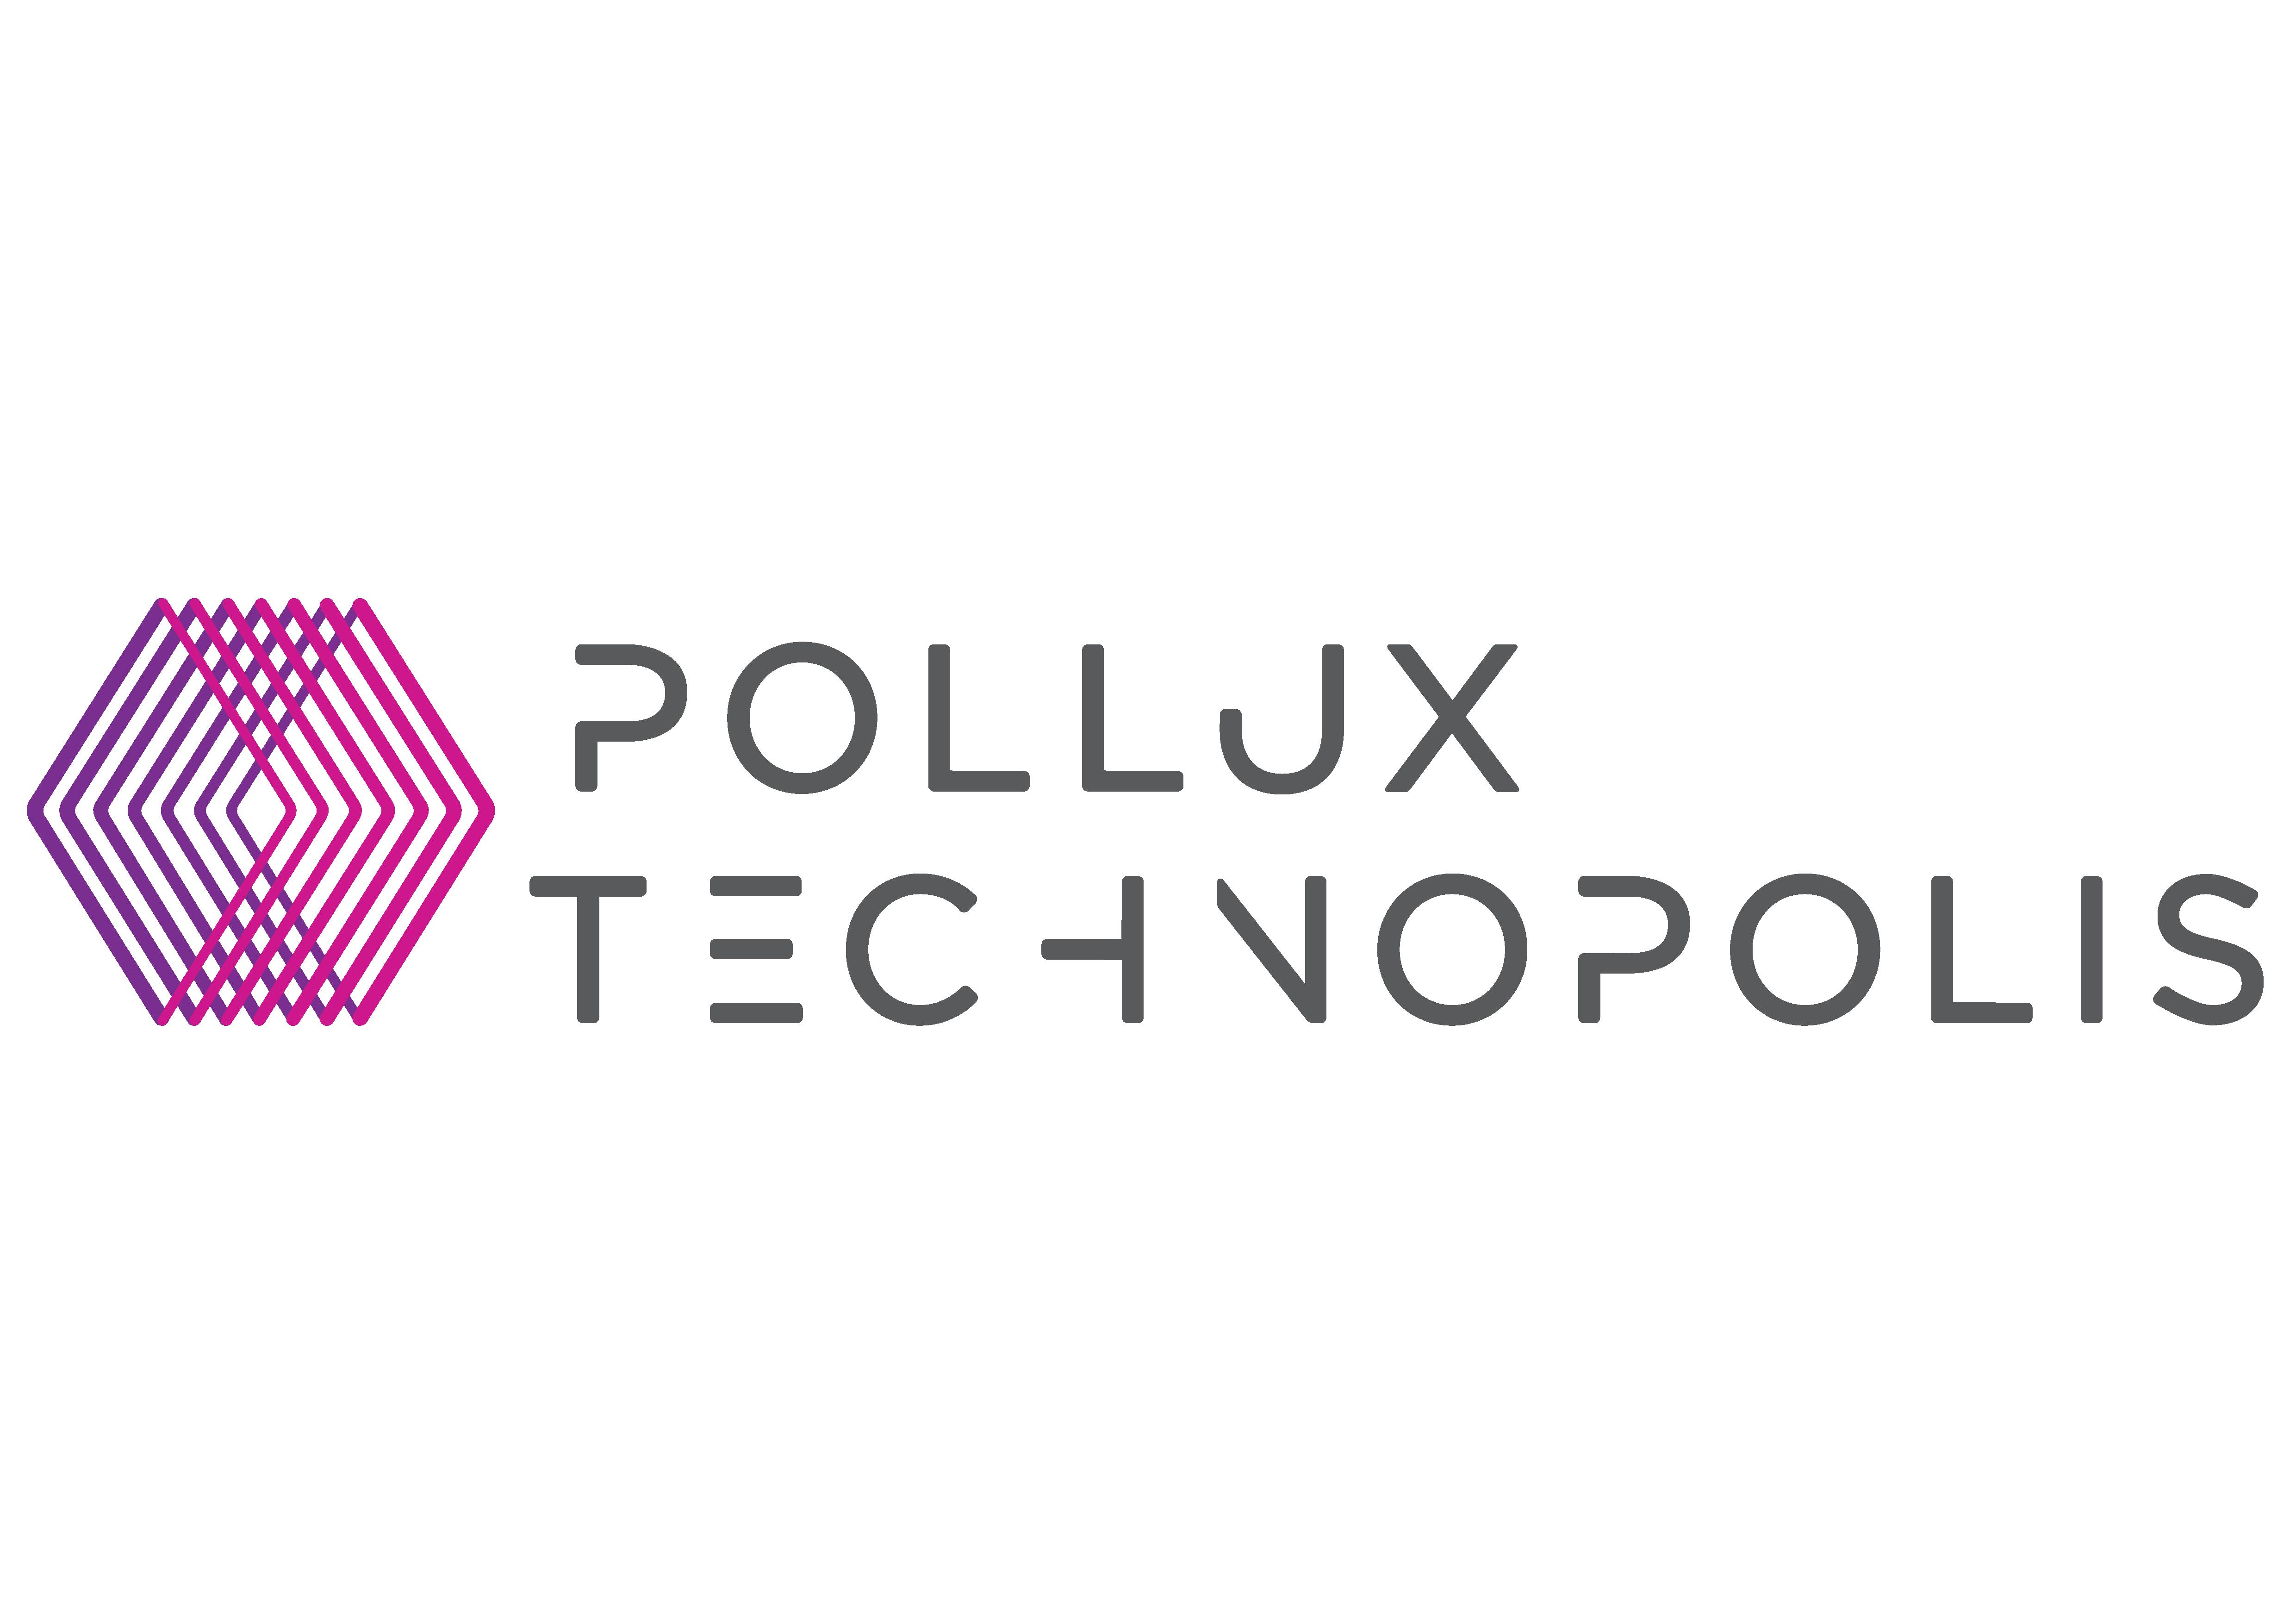 Pollux Technopolis